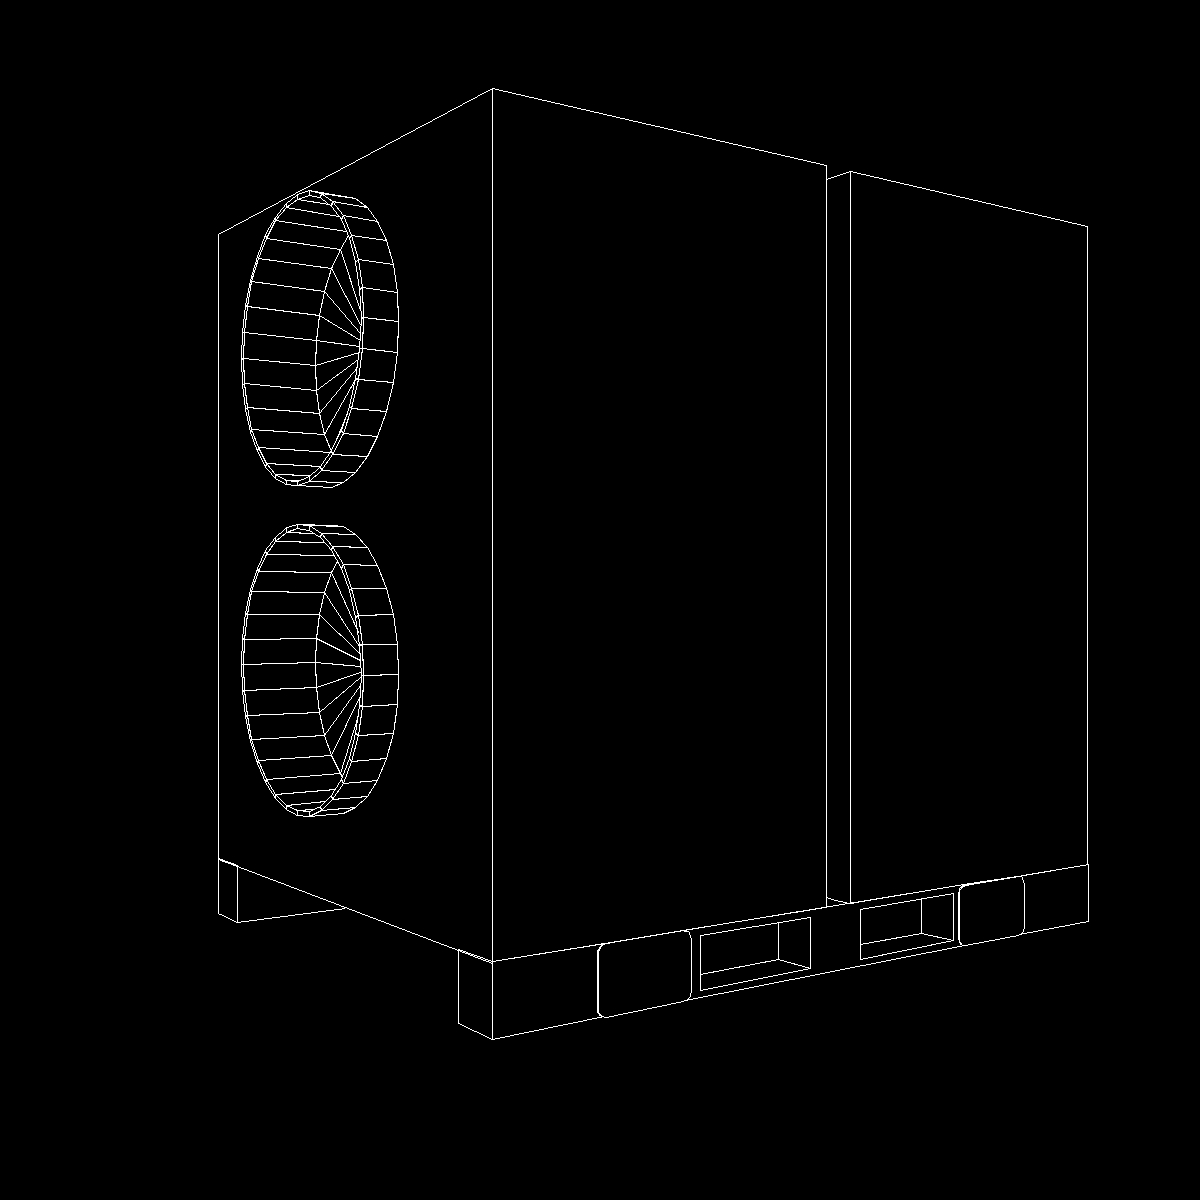 hvac air rover unit 3d model 3ds dxf cob x obj 153098